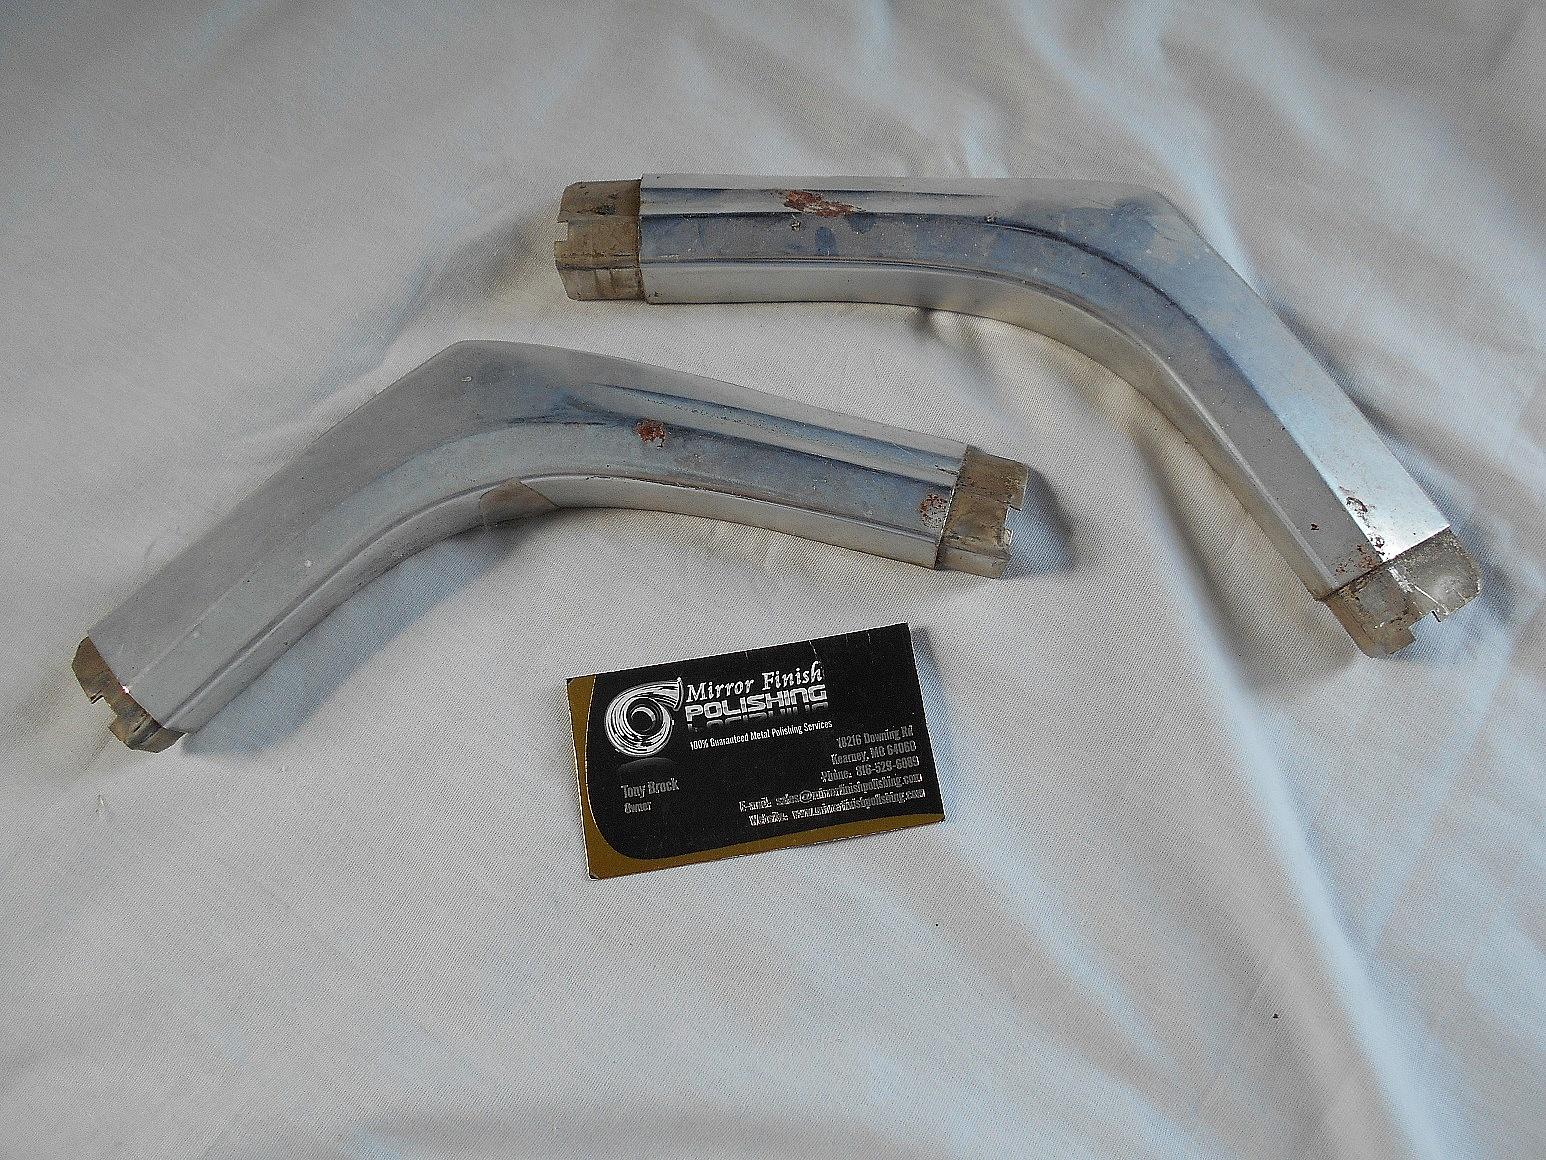 Metal Polishing Near Me >> Metal Polishing Buffing Services Premium Polishing Of Aluminum